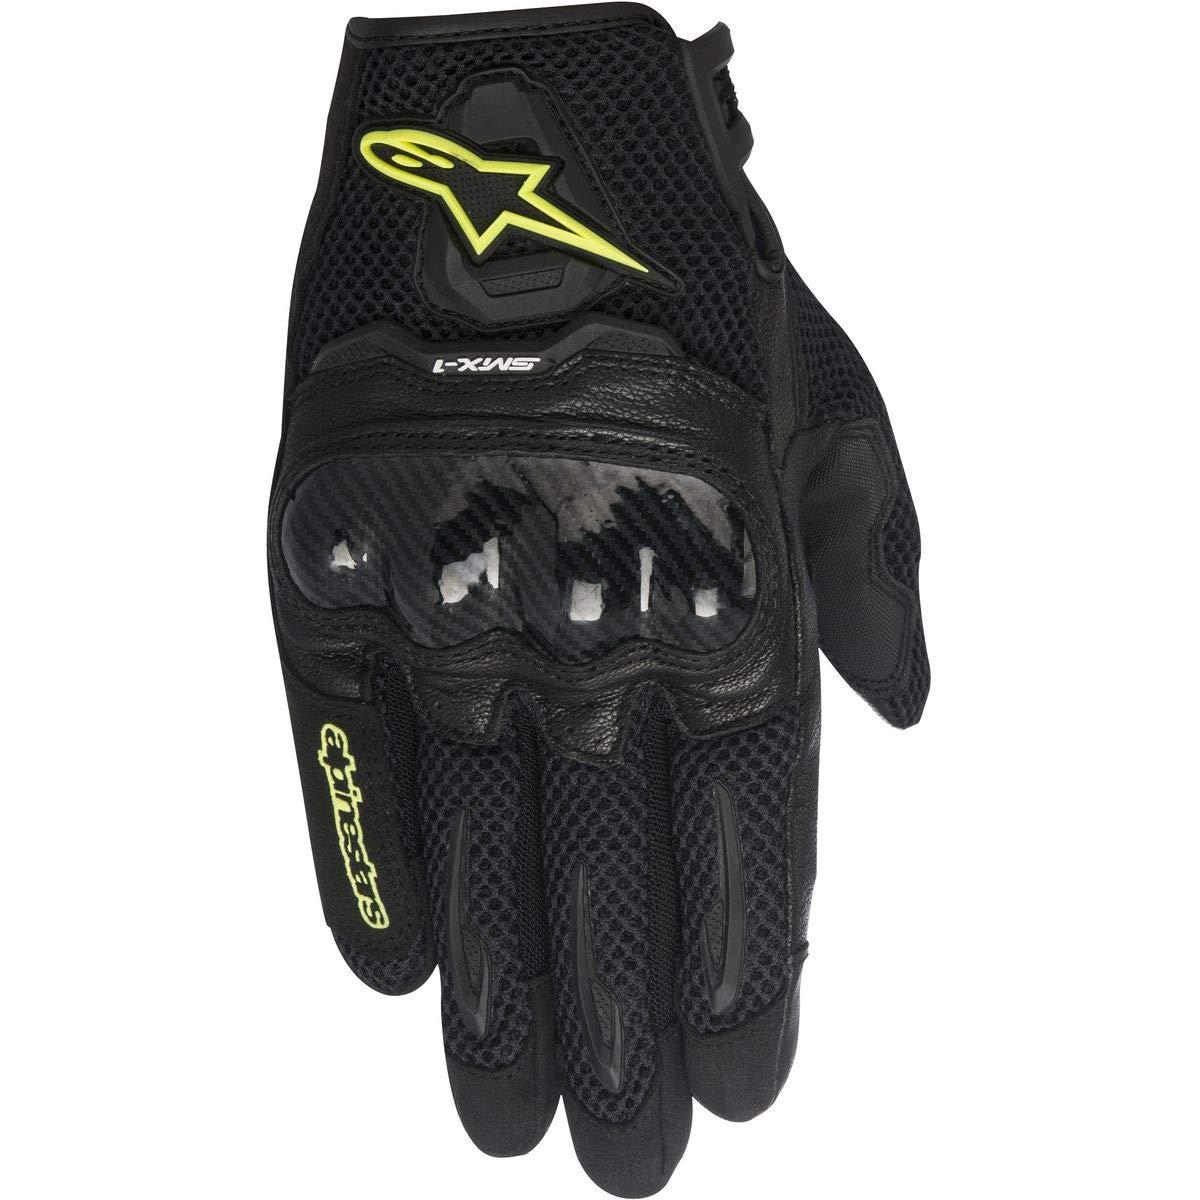 Alpinestars Women's 3590516-155-S Gloves Black/Yellow Small